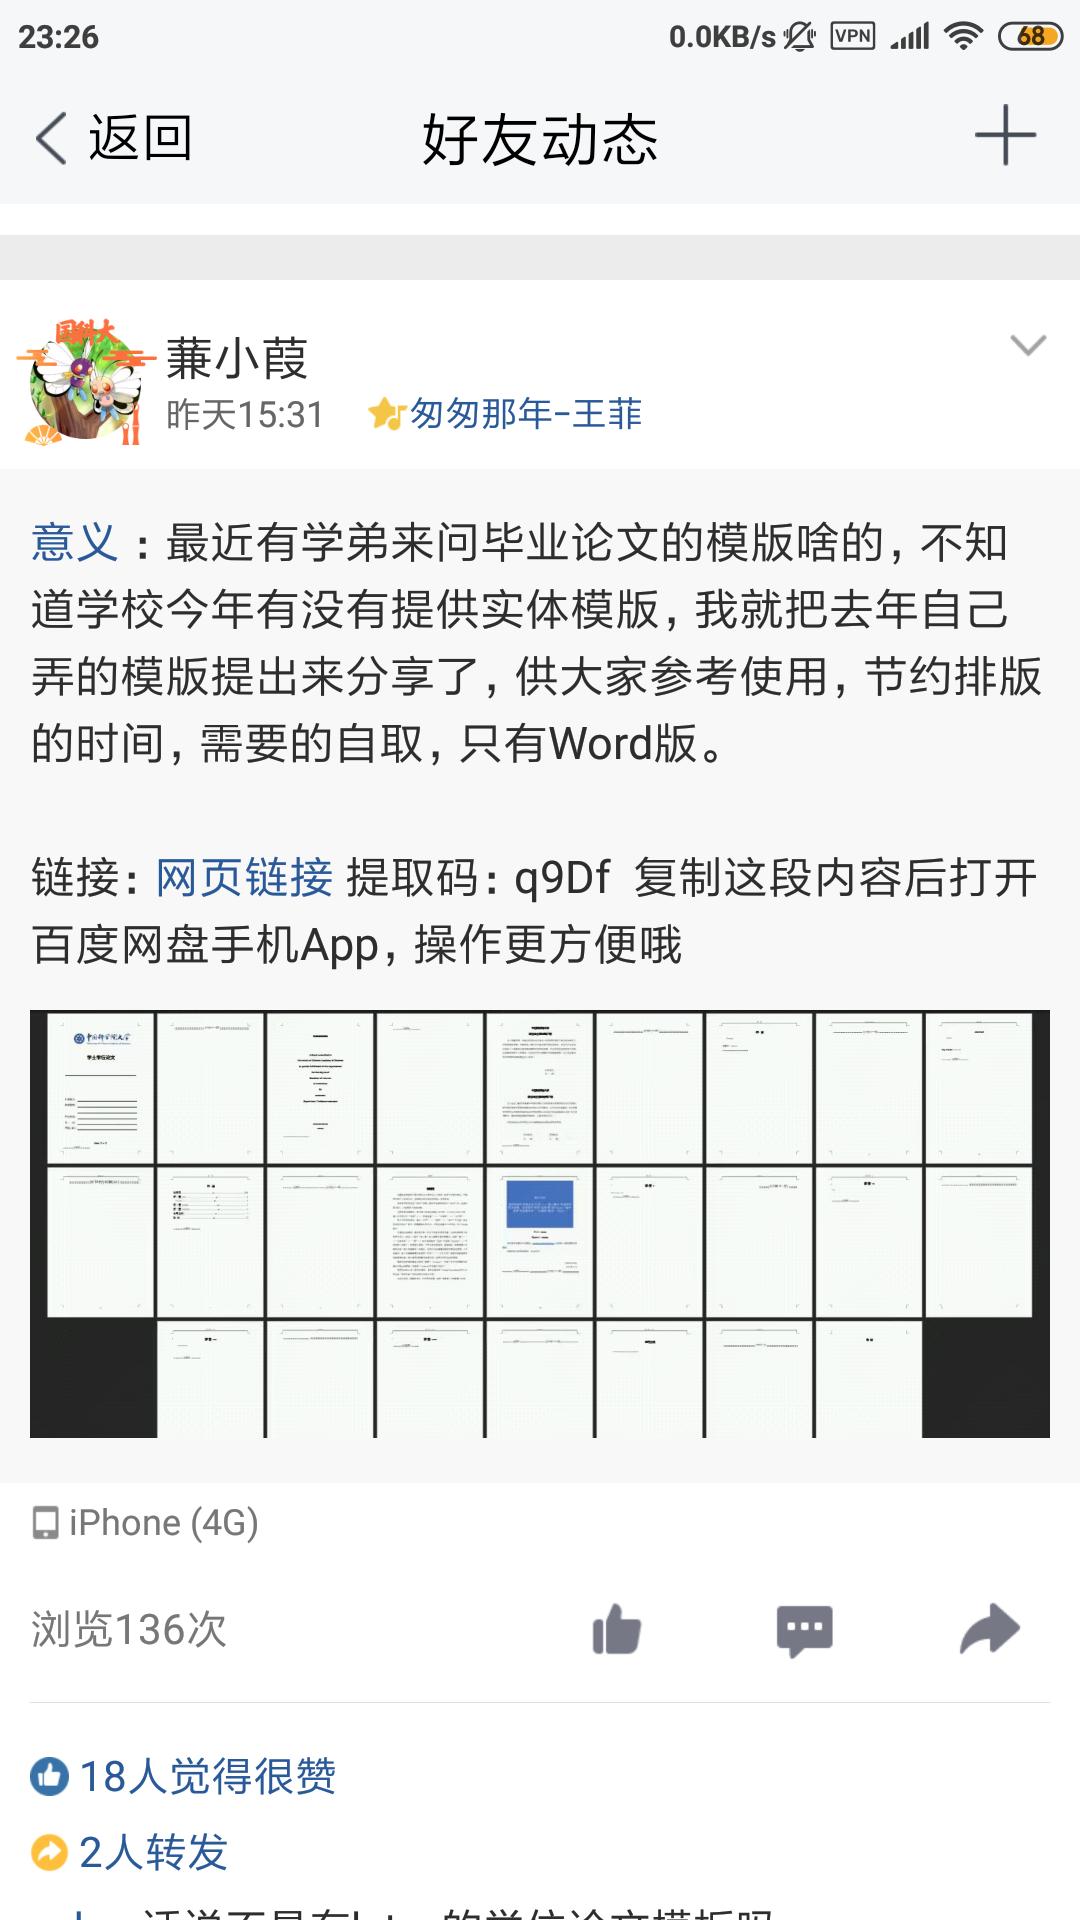 Screenshot_2019-04-04-23-26-18-488_com tencent tim